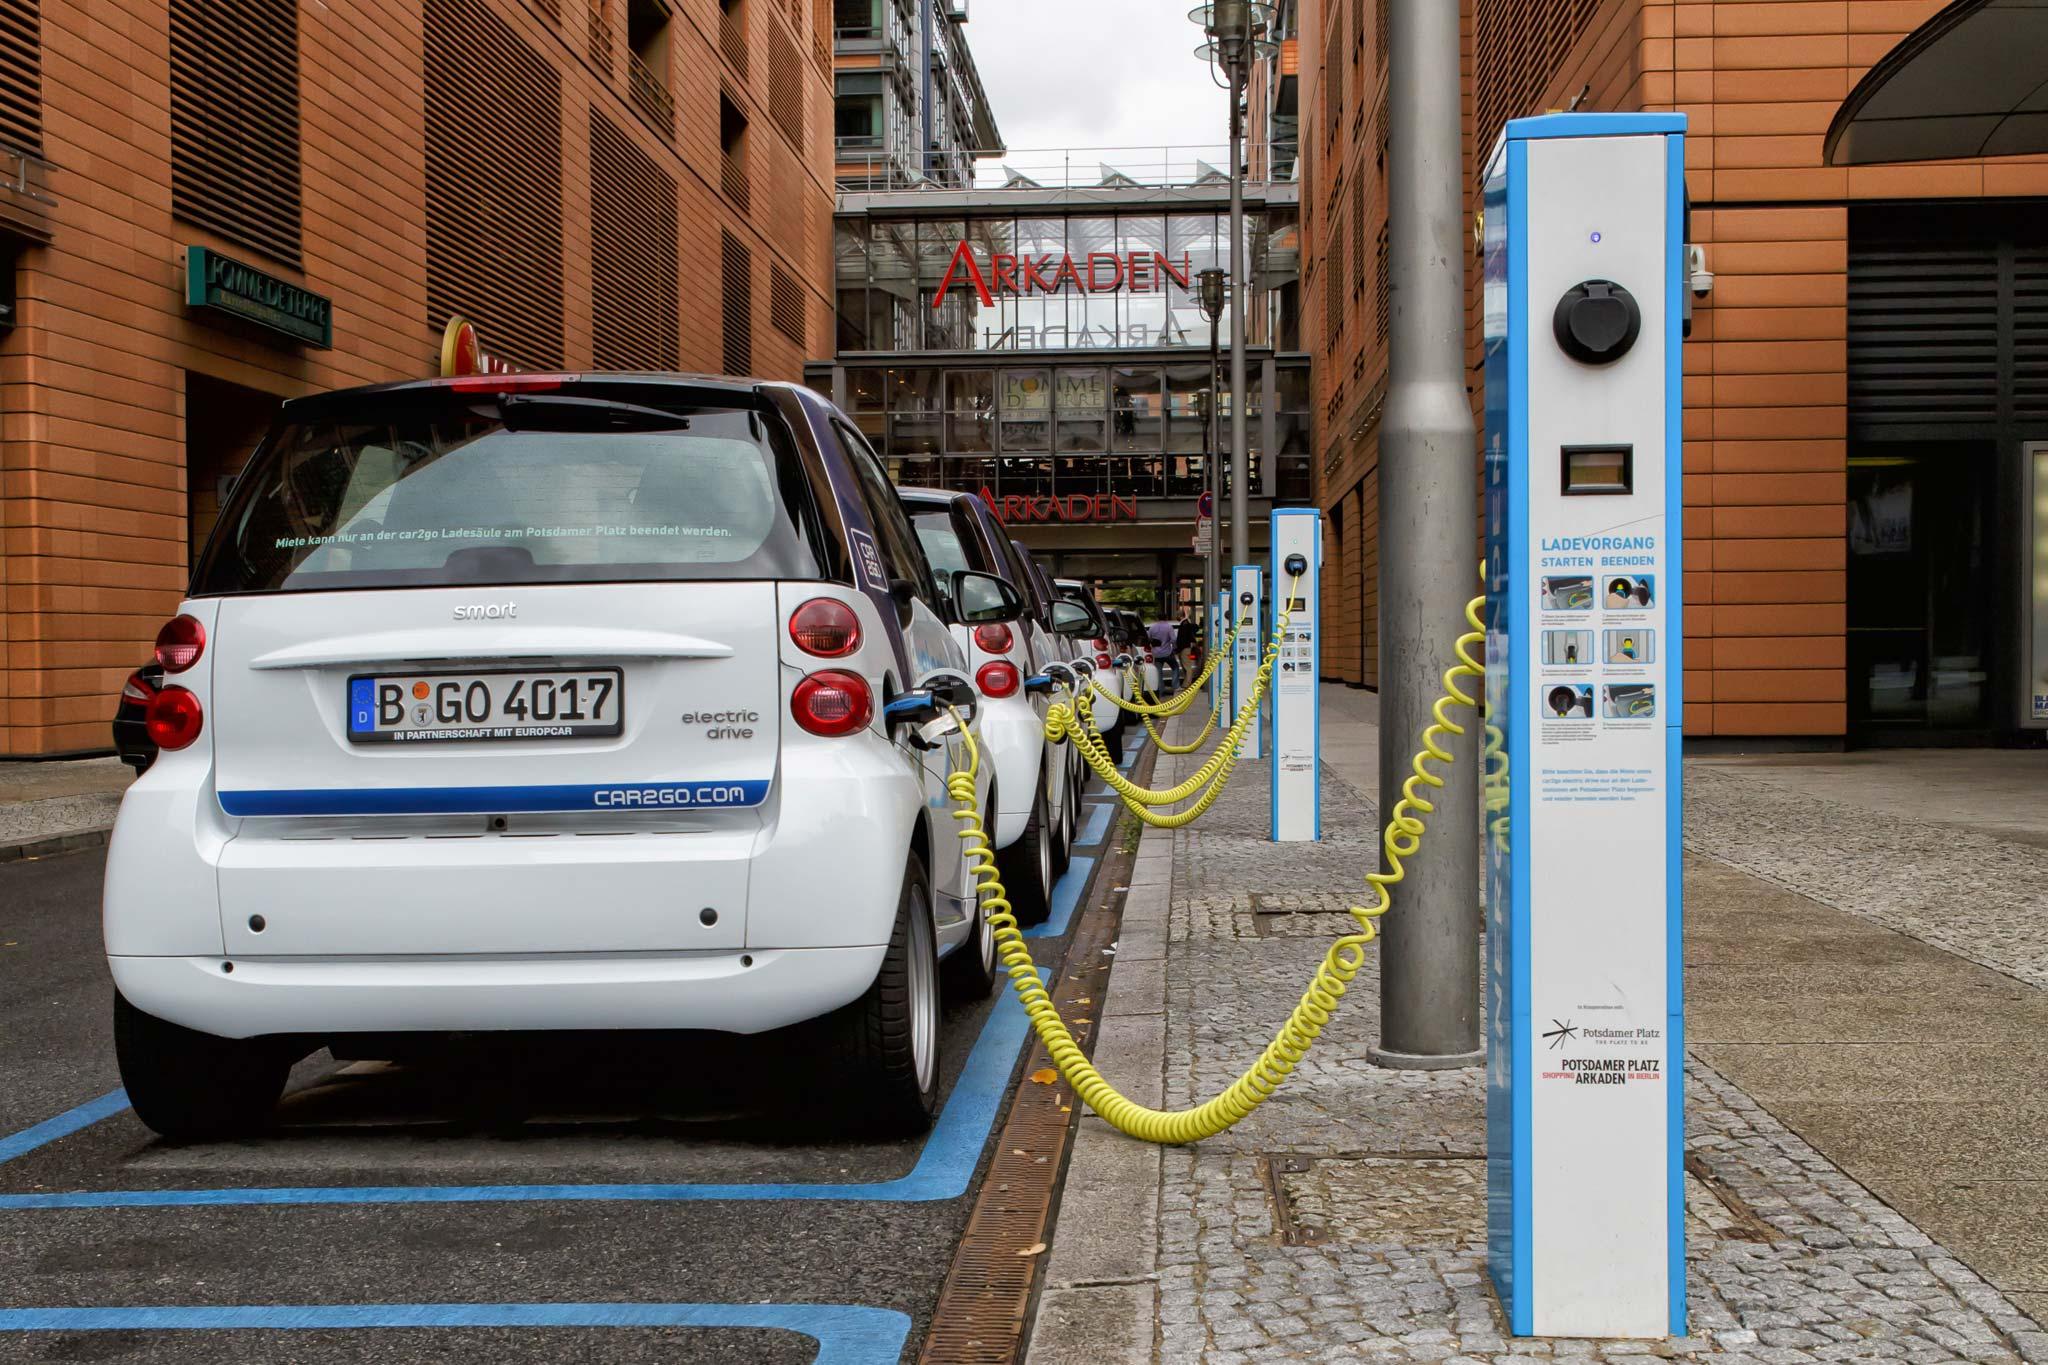 Perché la mobilità elettrica cresce sempre di più